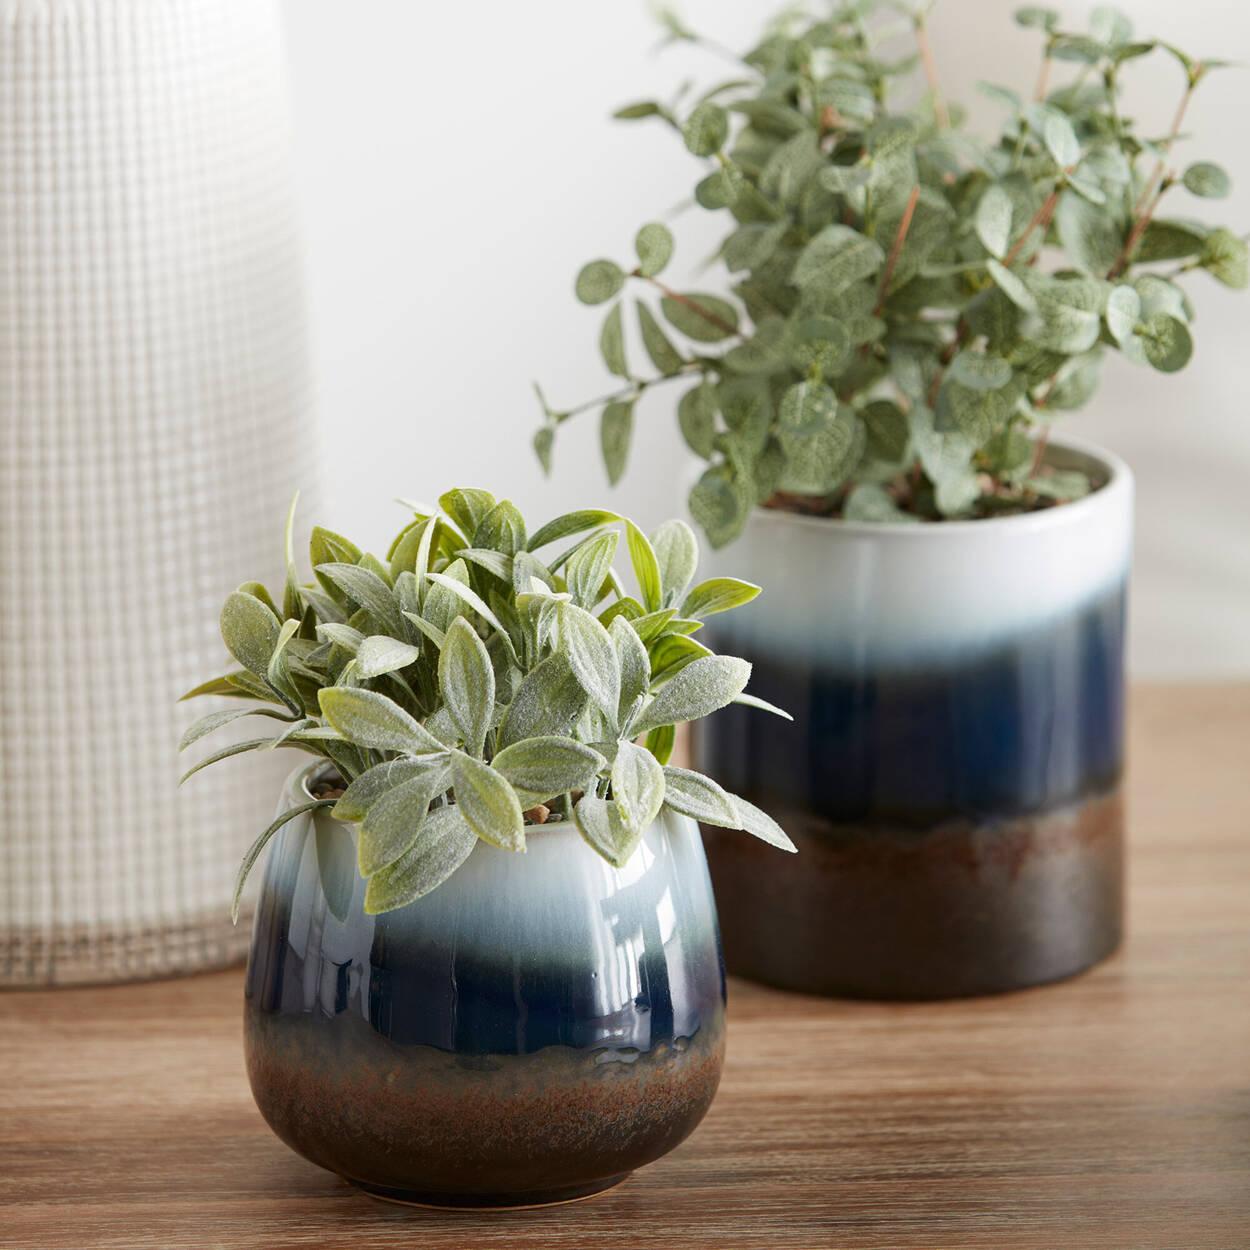 Eucalyptus in Reactive 3-Tone Ceramic Pot 12 x 25 cm.